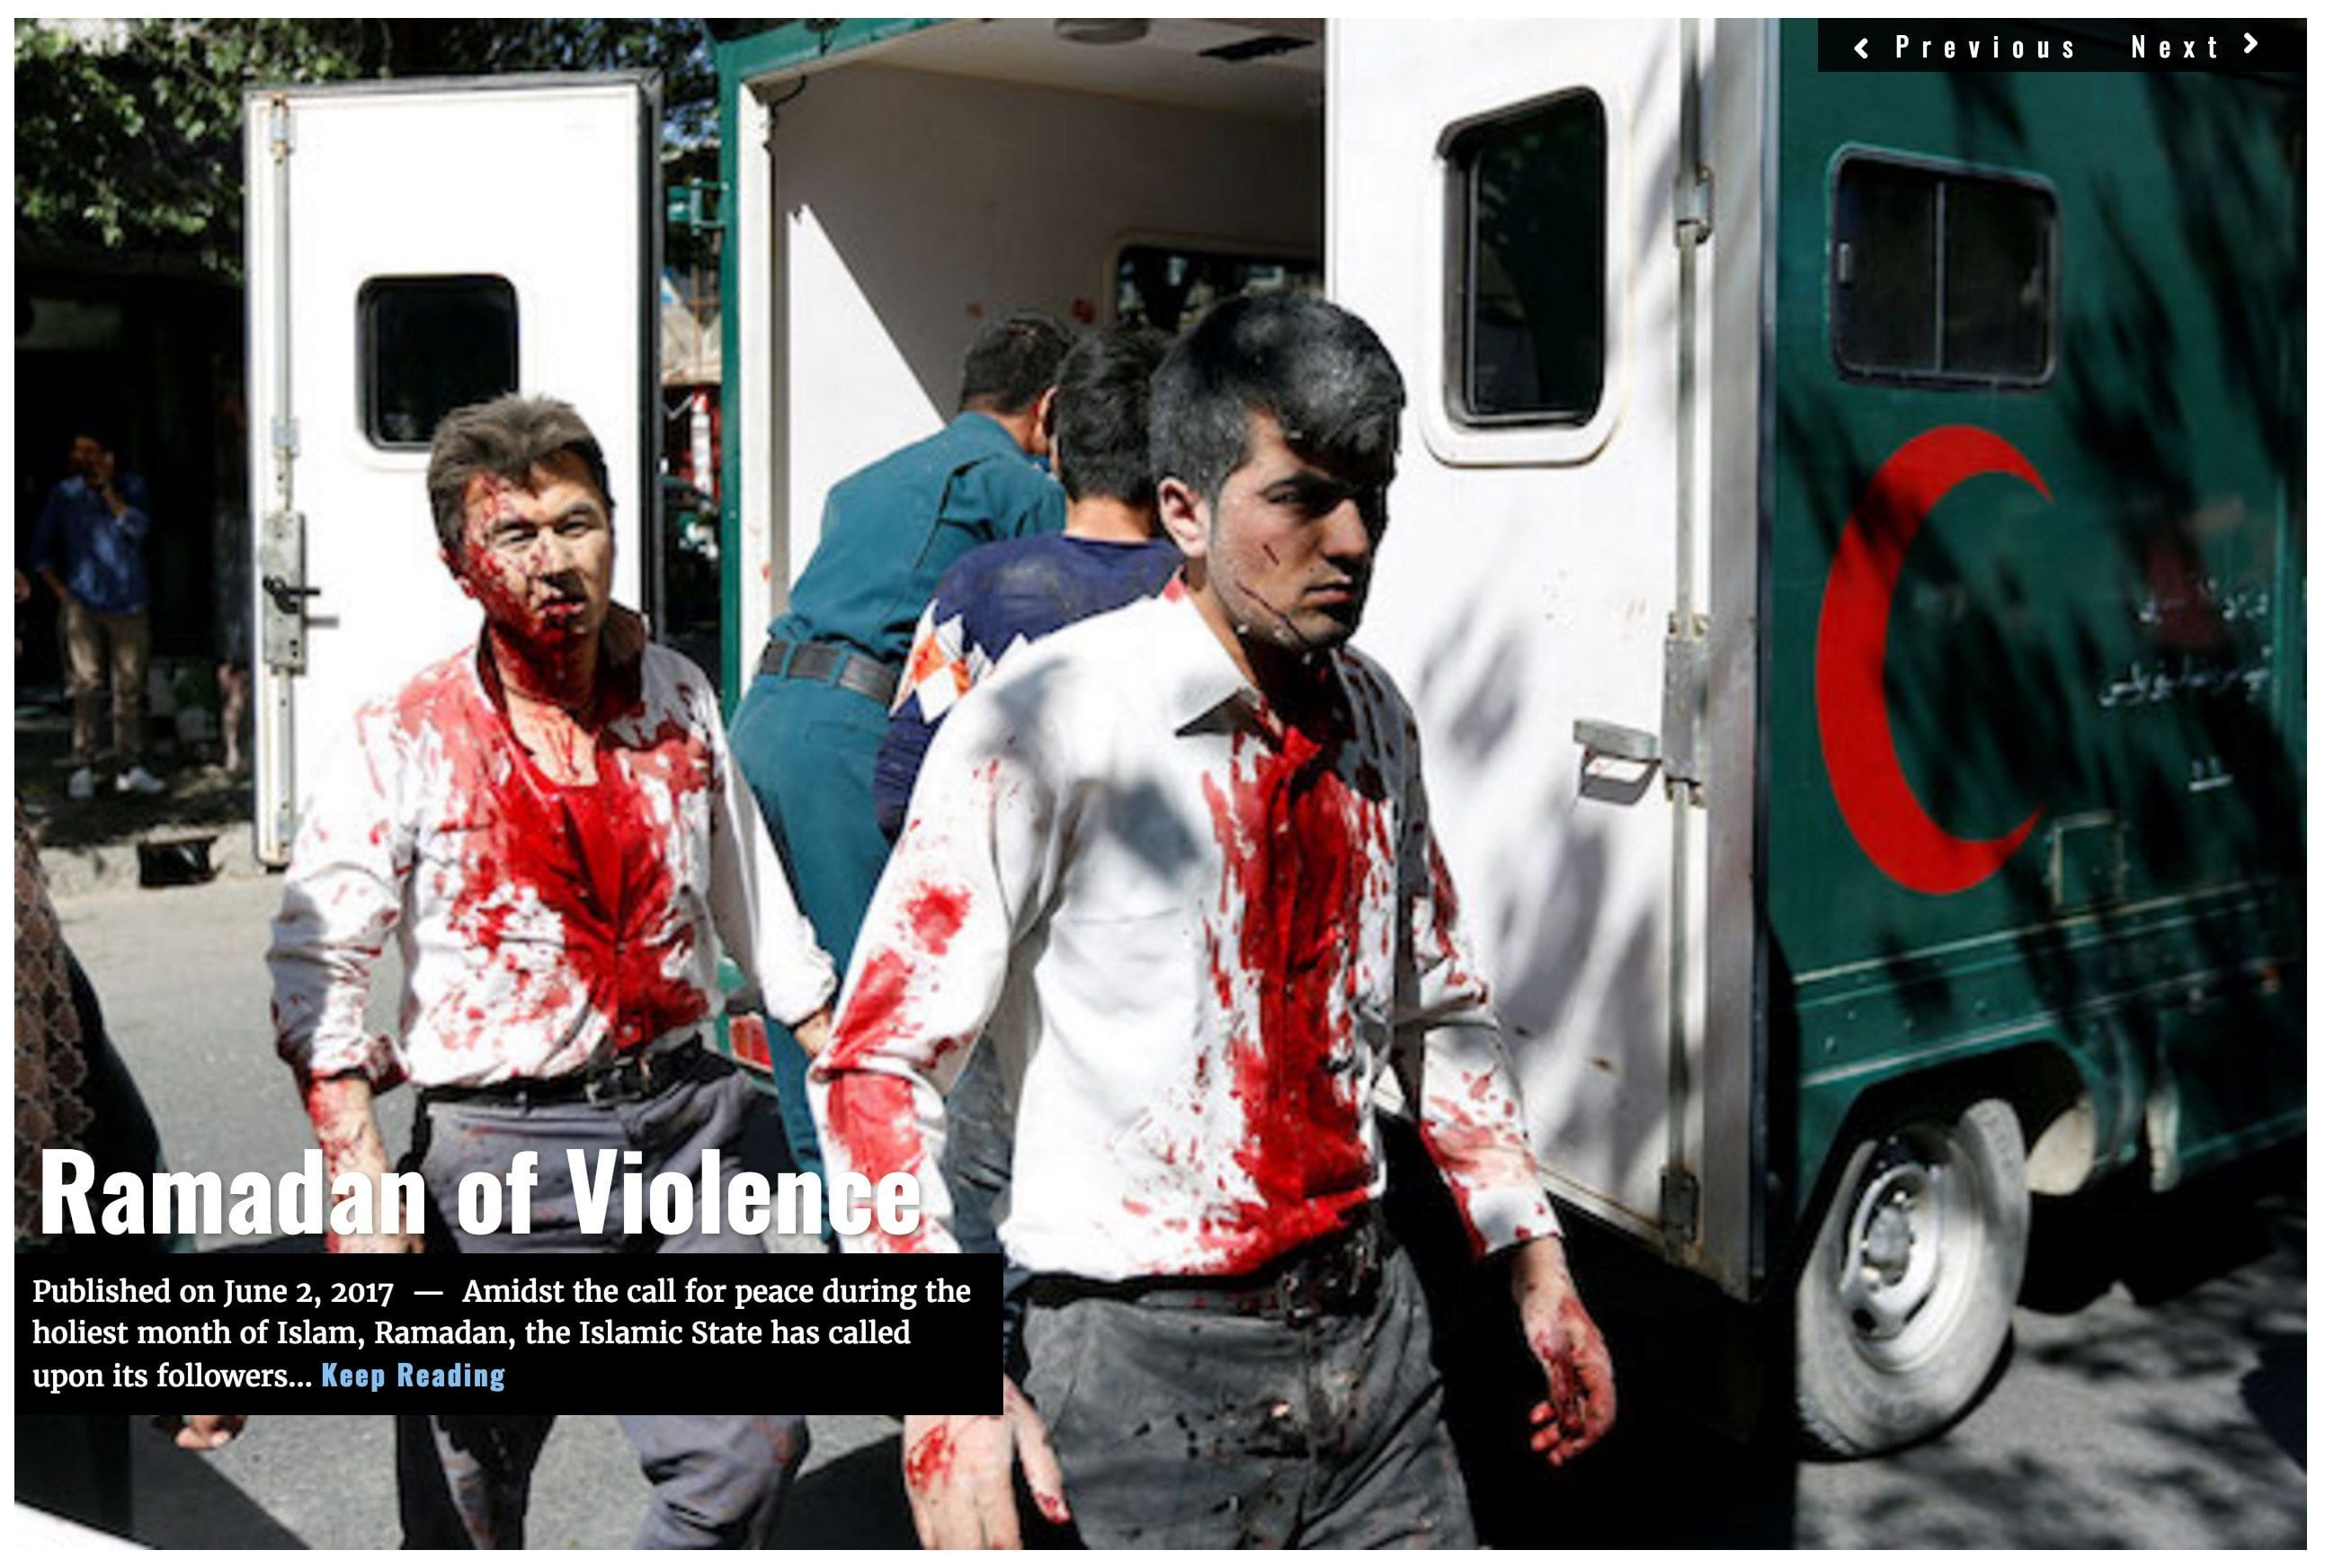 Headline Ramadan of Violence